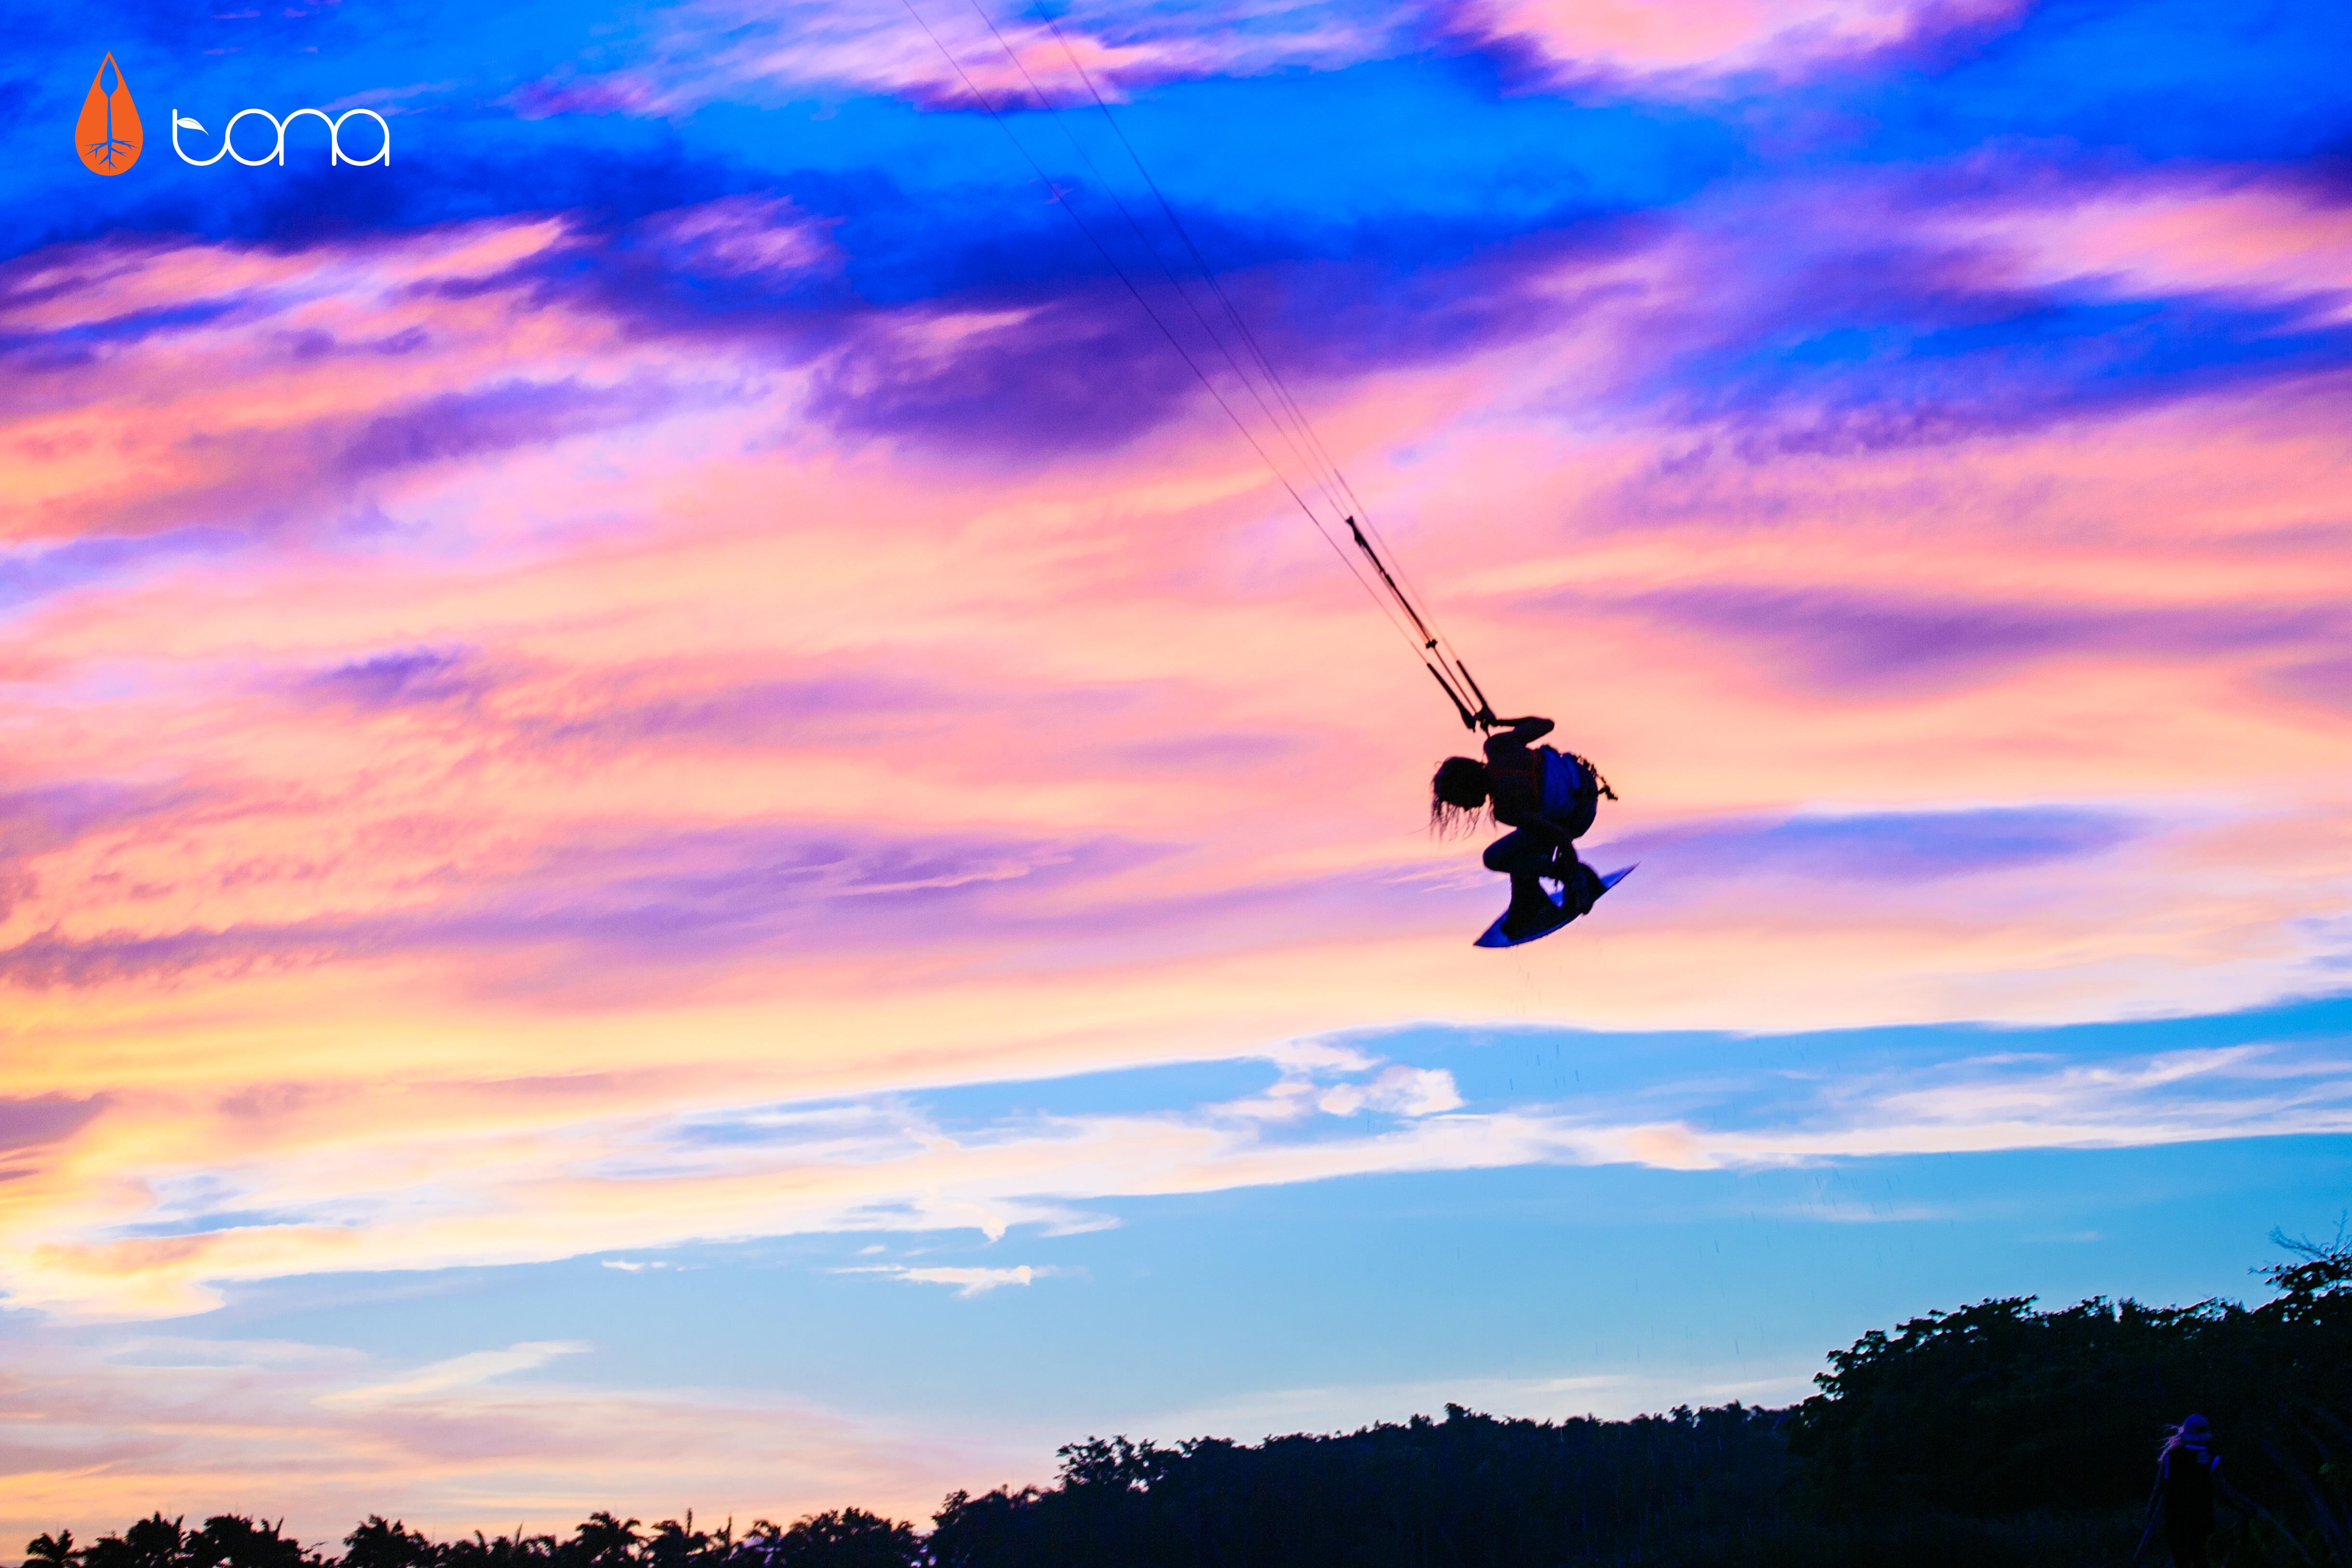 kitesurf wallpaper image - Indie grab at sunset with Tona Boards - kitesurfing - in resolution: Original 4877 X 3252